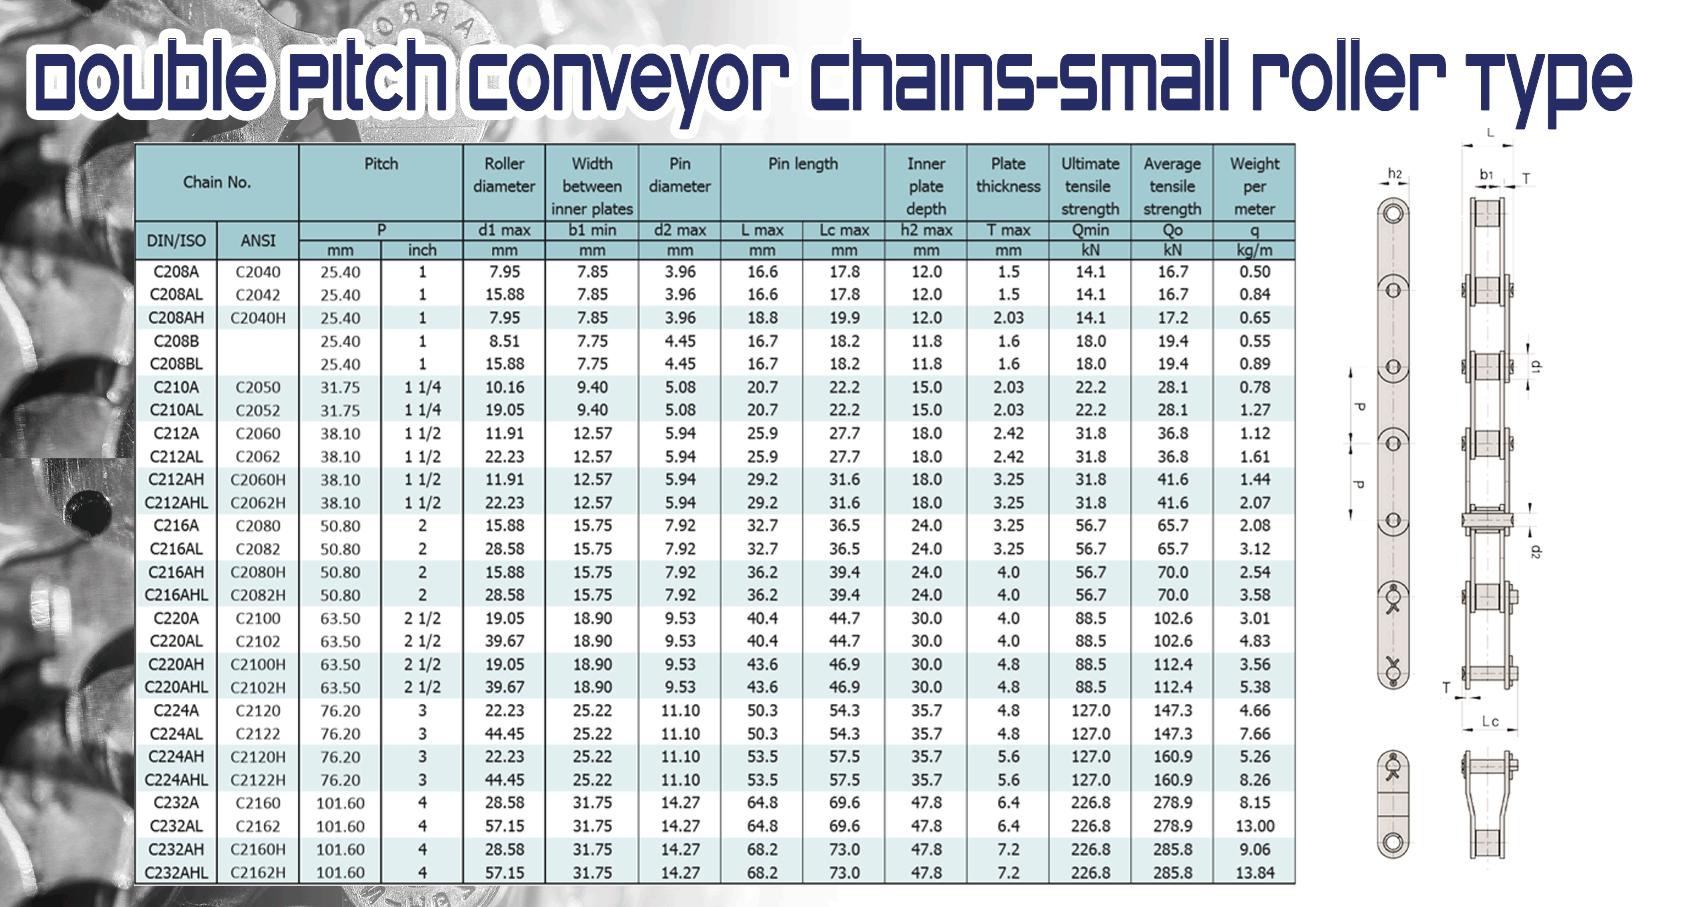 Double Pitch Conveyor Chains-Small roller Type โซ่ลำเลียงพิชคู่ แบบโรเลอร์เล็ก